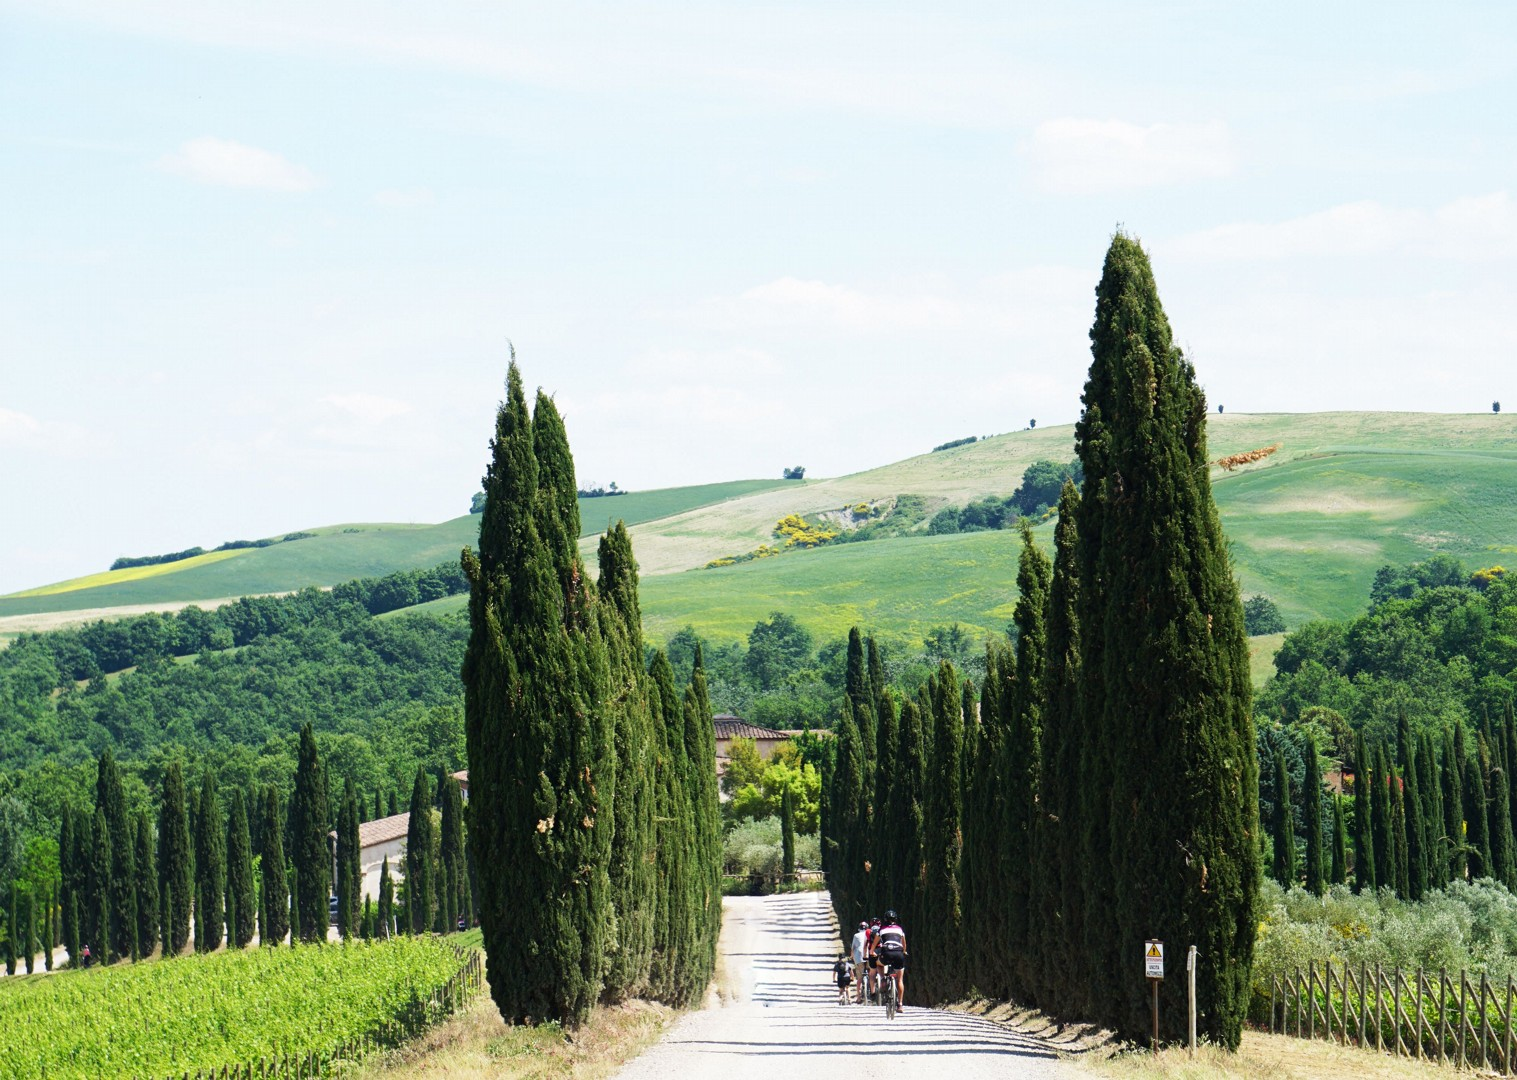 groves-italy-tuscany-cycling-holiday.jpg - Italy - Tuscany Tourer - Guided Road Cycling Holiday - Italia Road Cycling